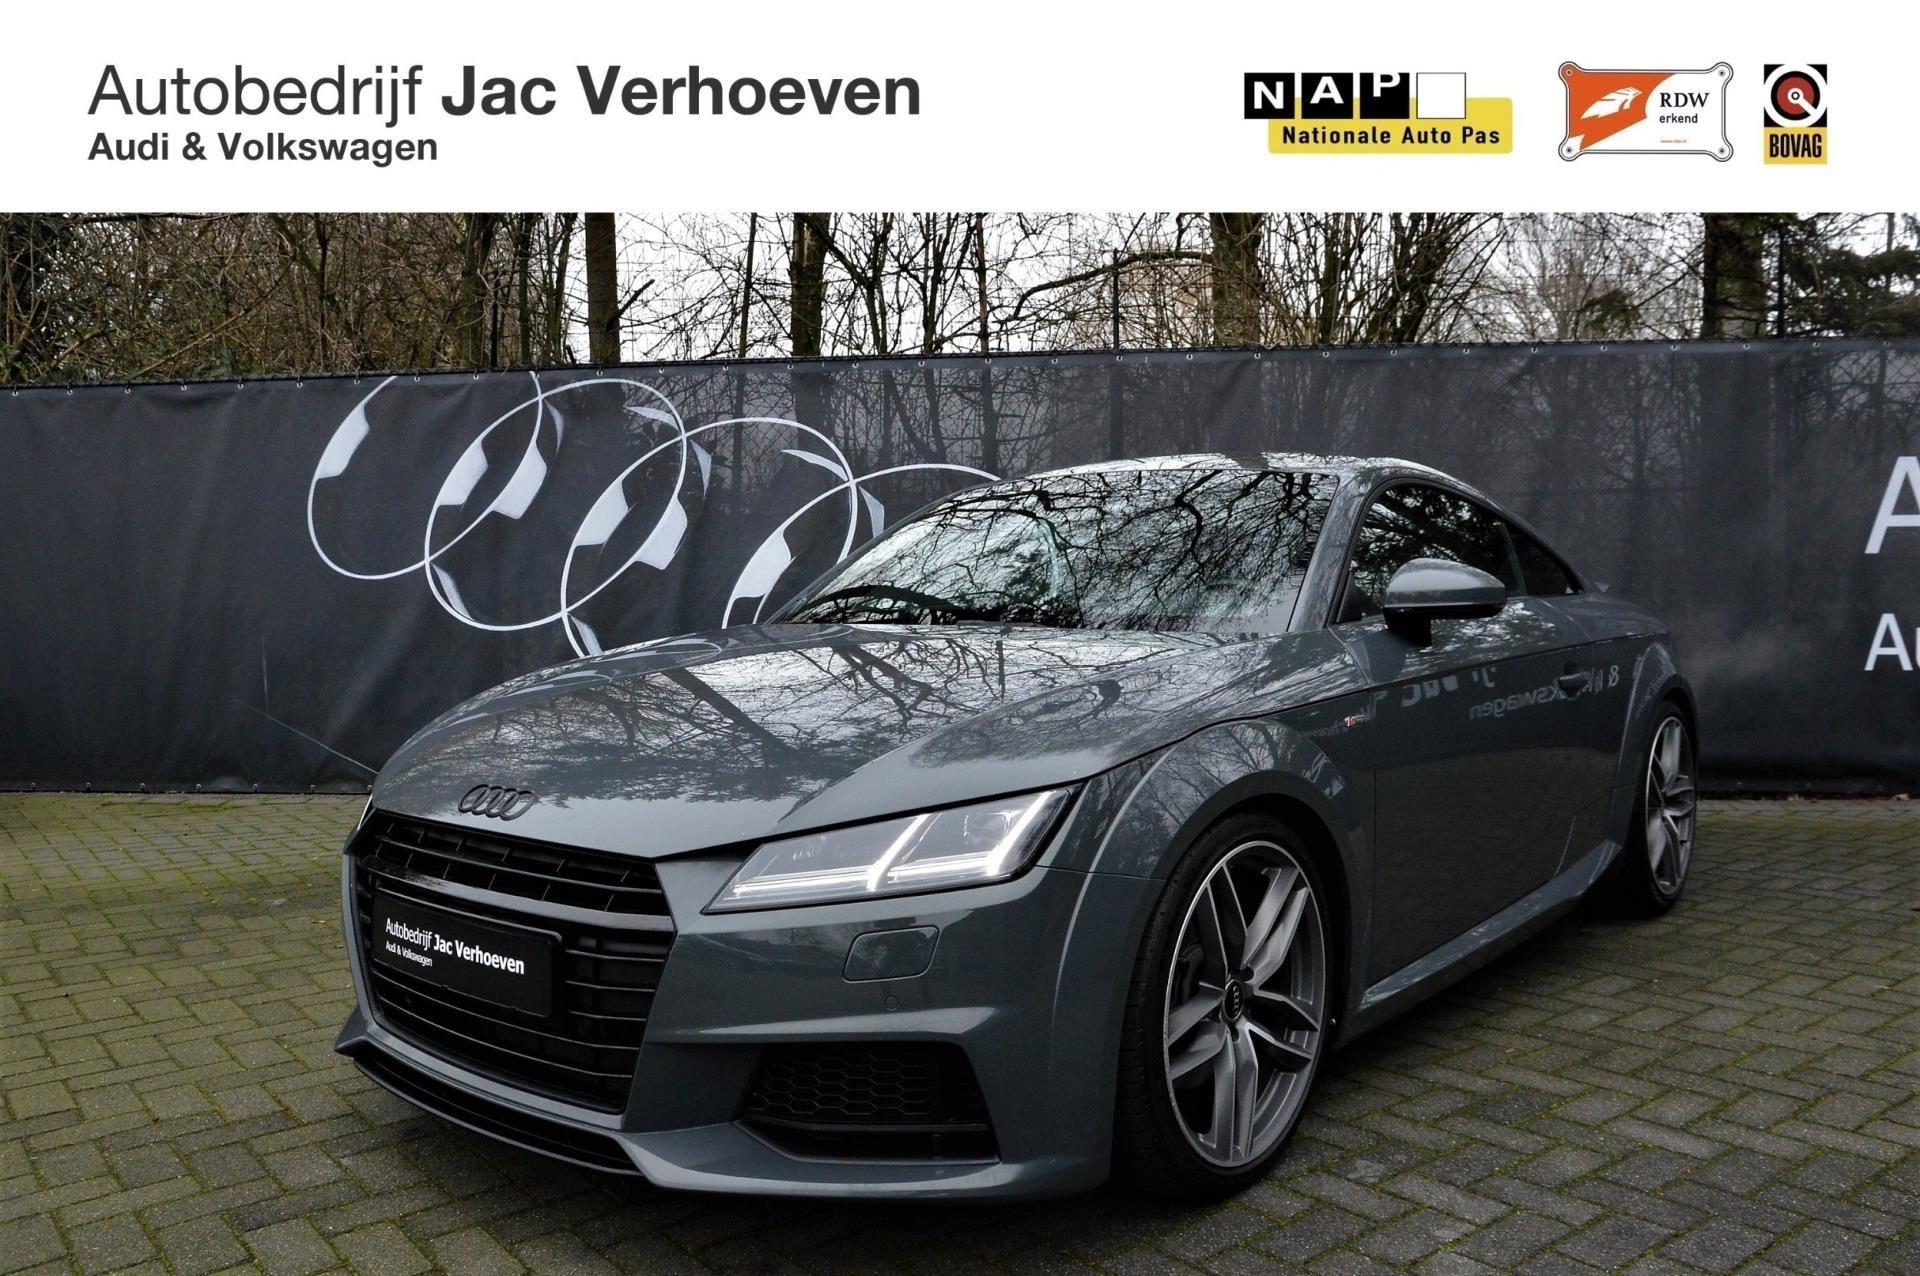 Audi TT occasion - Autobedrijf Jac Verhoeven